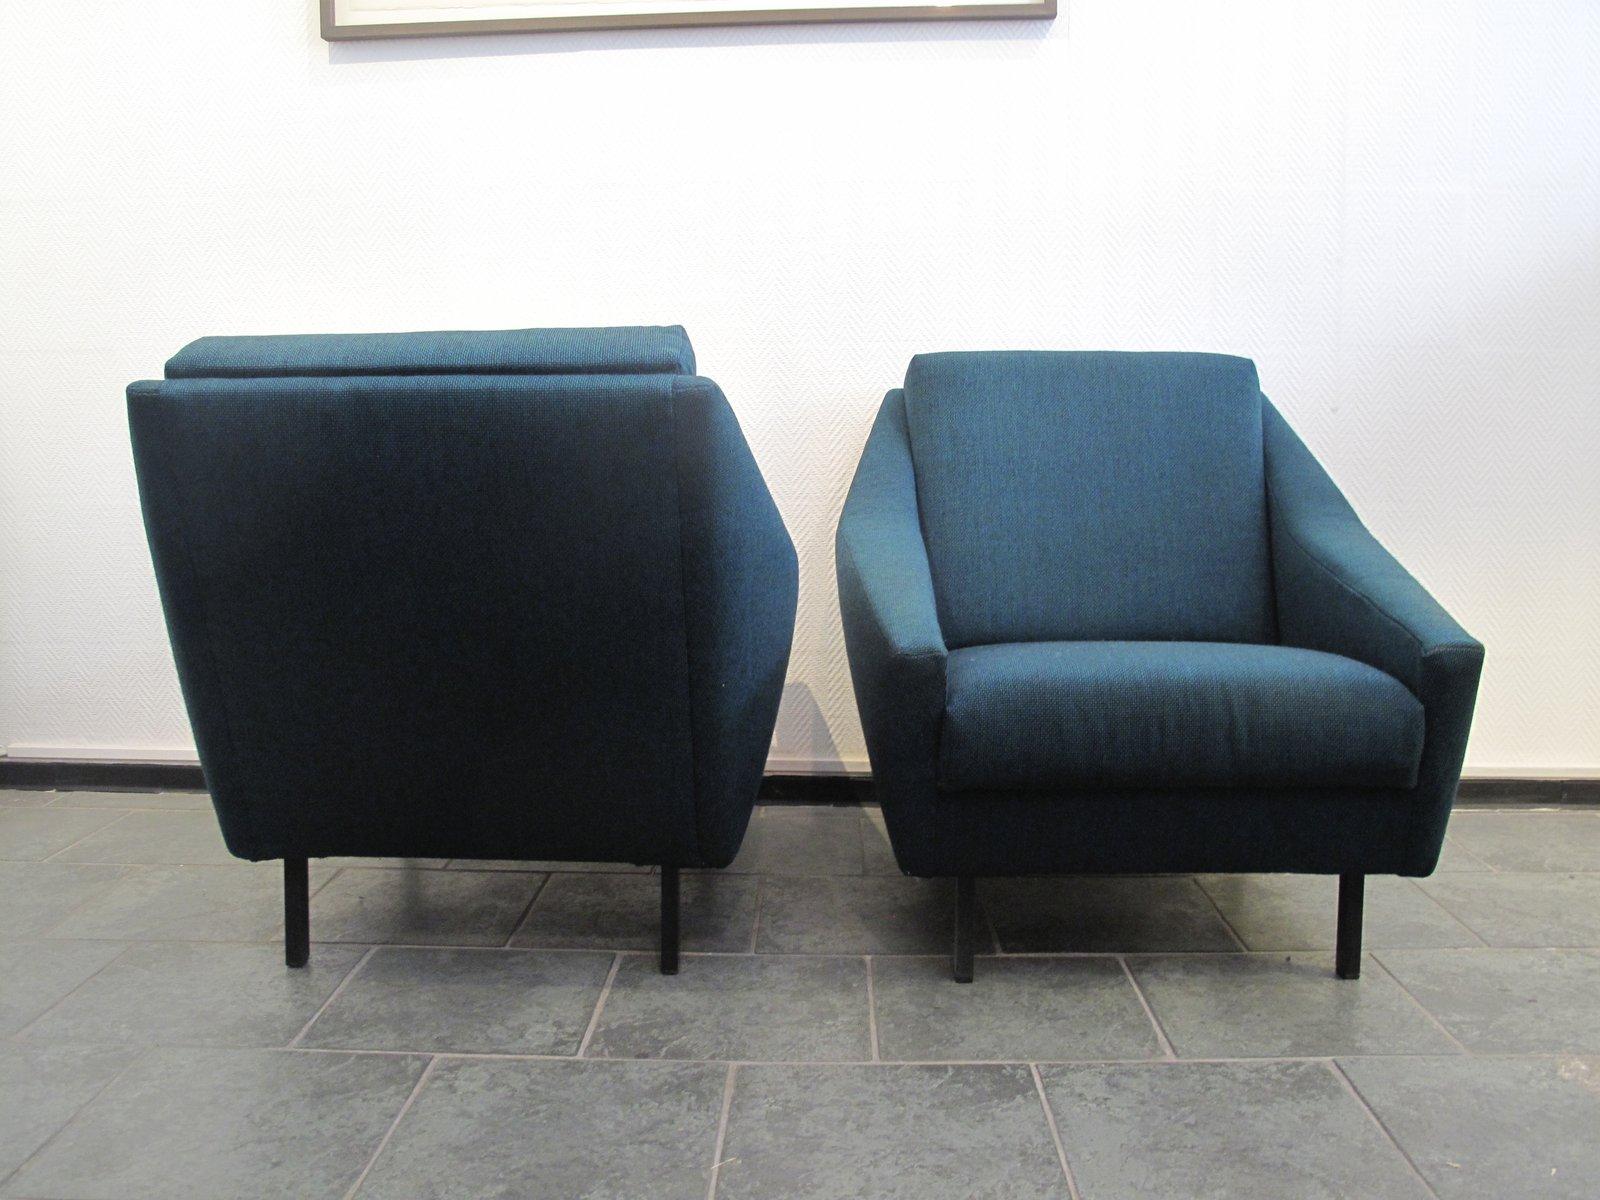 blaue italienische mid century sessel 1970er 2er set bei pamono kaufen. Black Bedroom Furniture Sets. Home Design Ideas